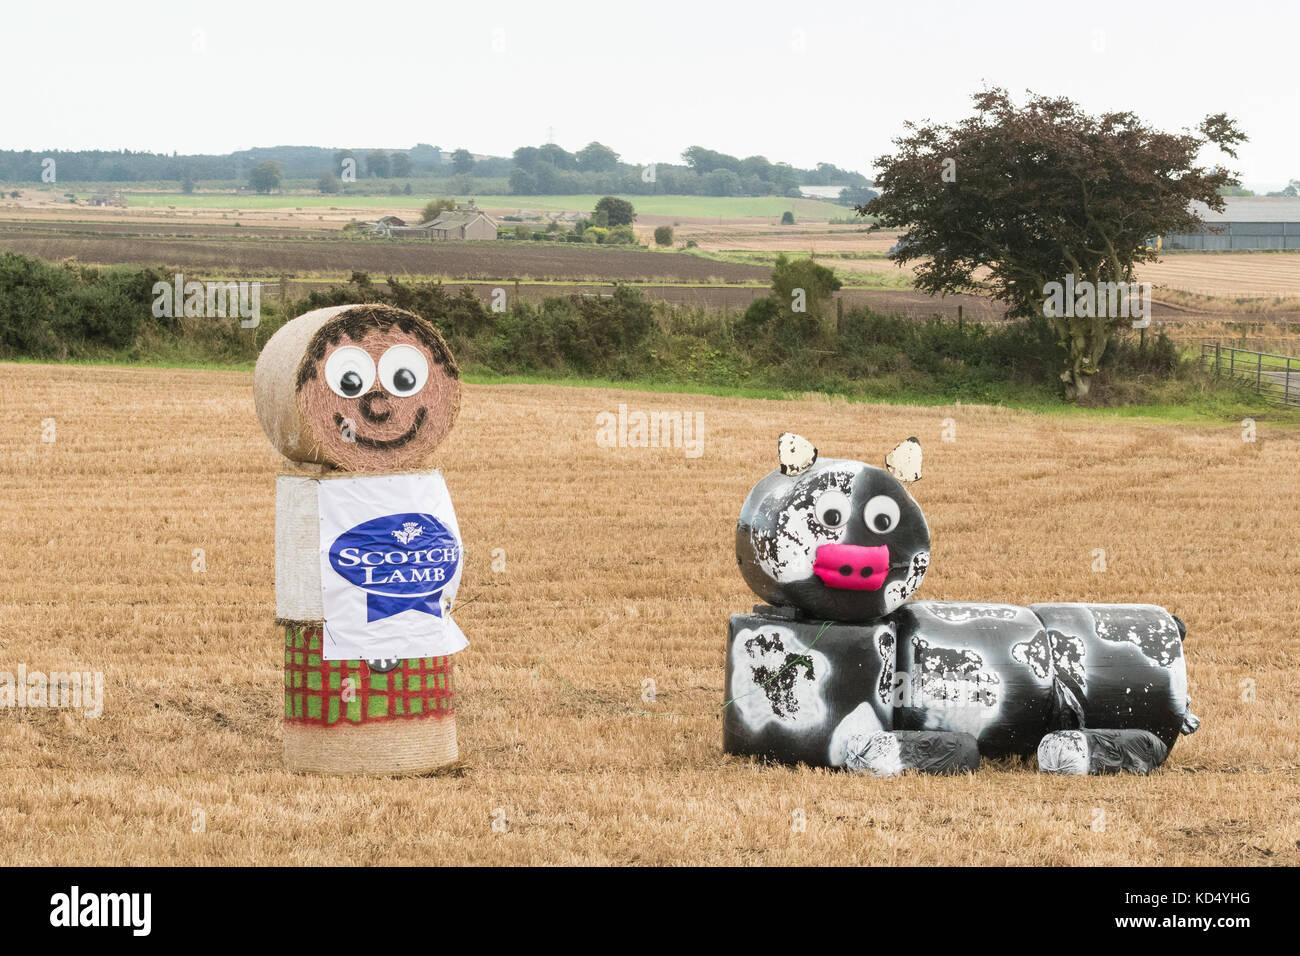 Young Farmers bale art promoting Scotch Lamb, Scotland, UK - Stock Image